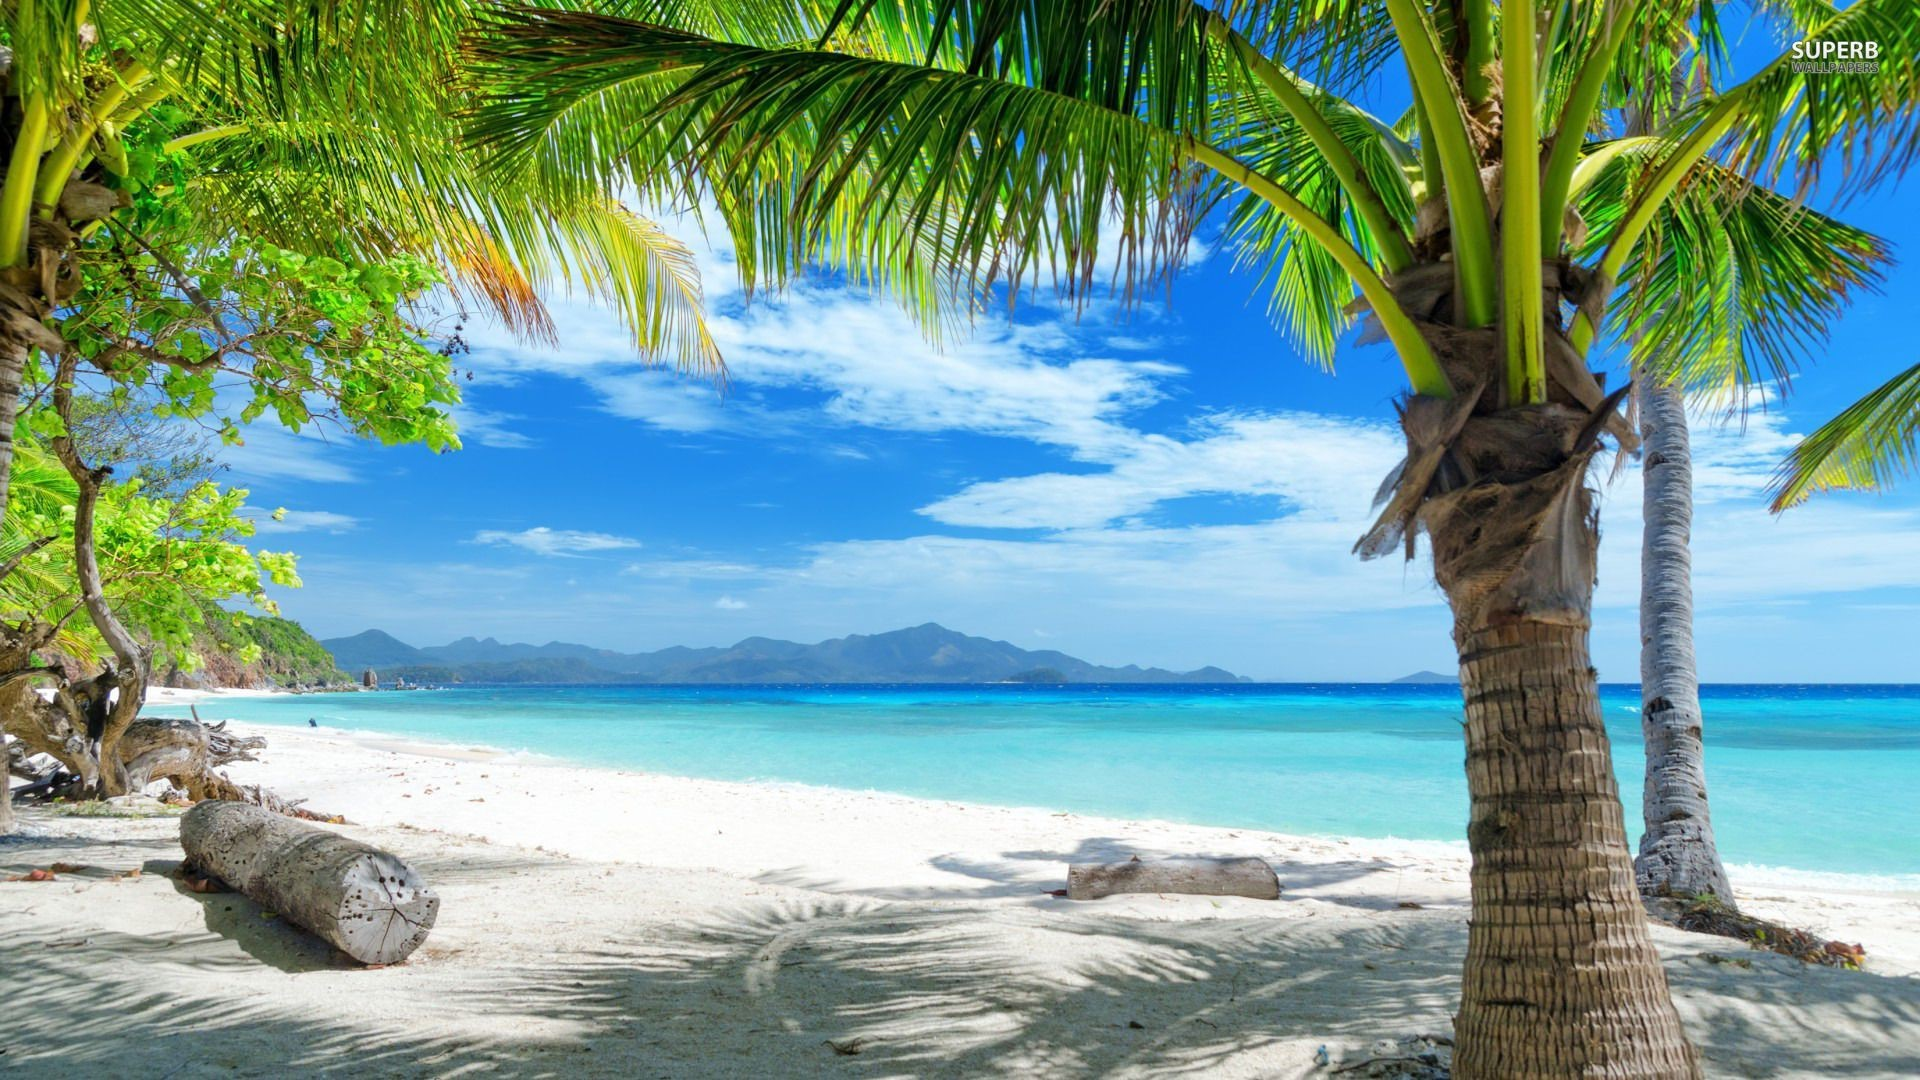 Tropical Beach Landscape Windows Background